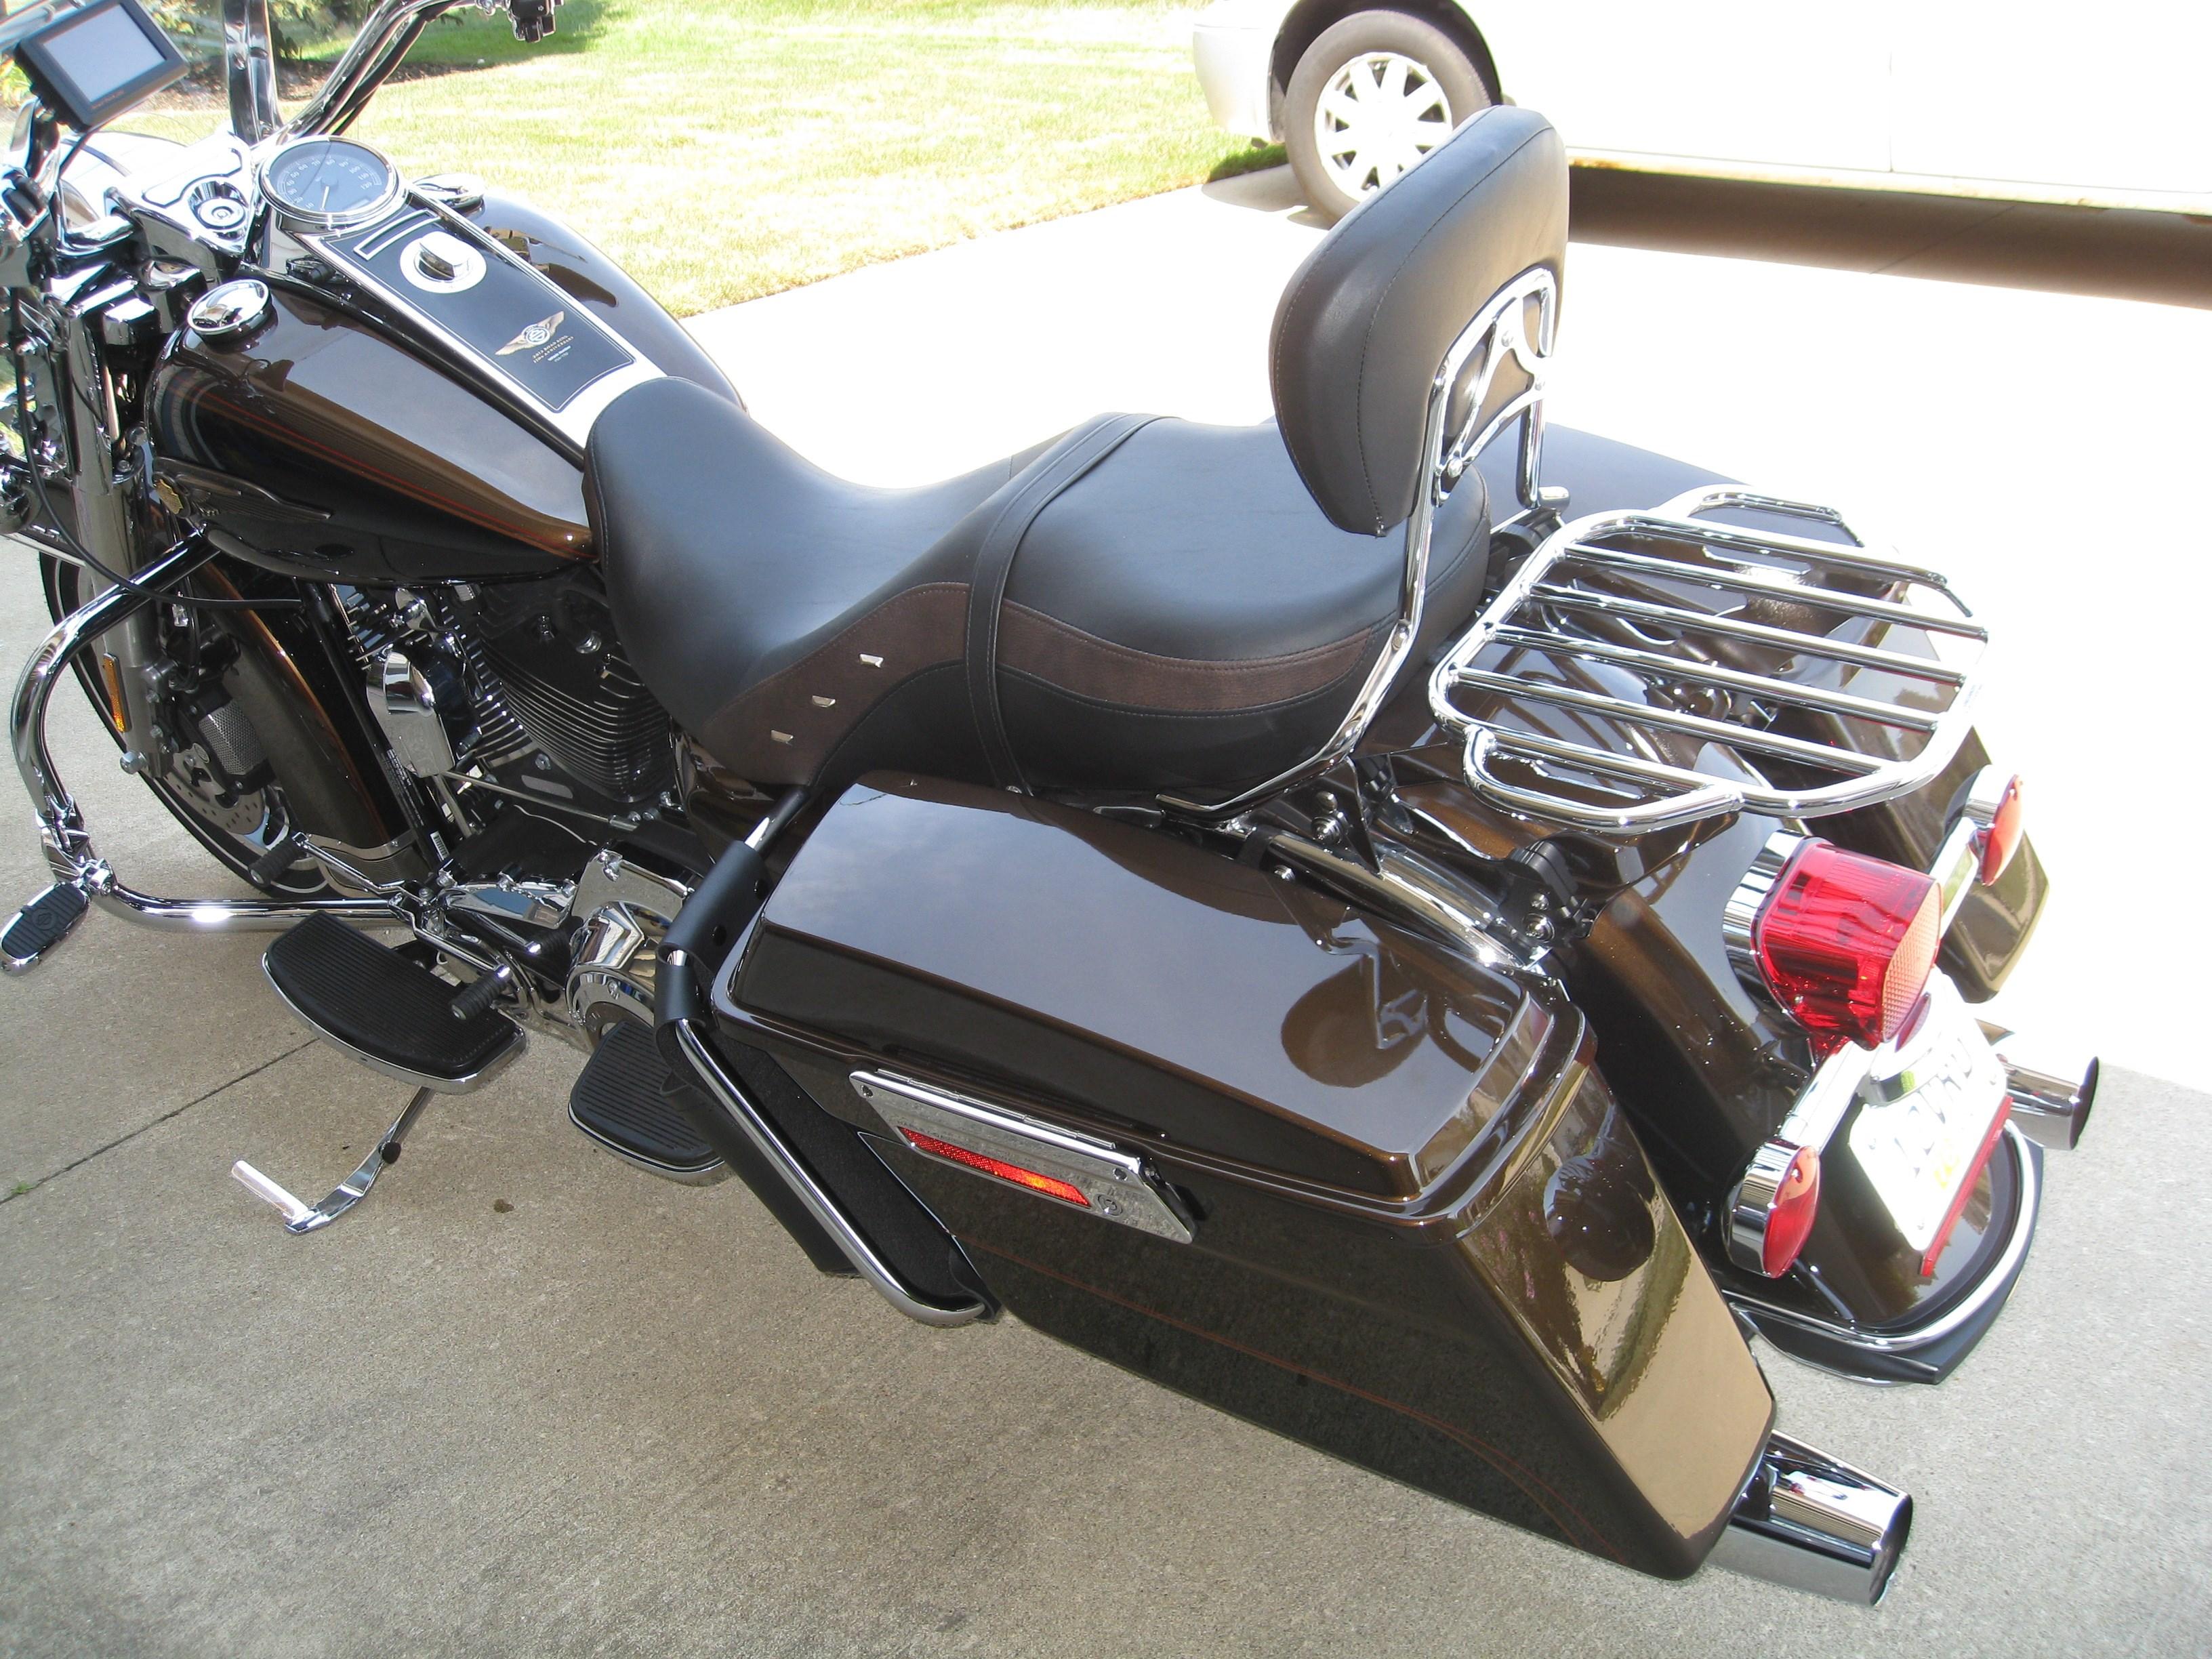 2013 Harley Davidson 174 Flhr Anv Road King 174 110th